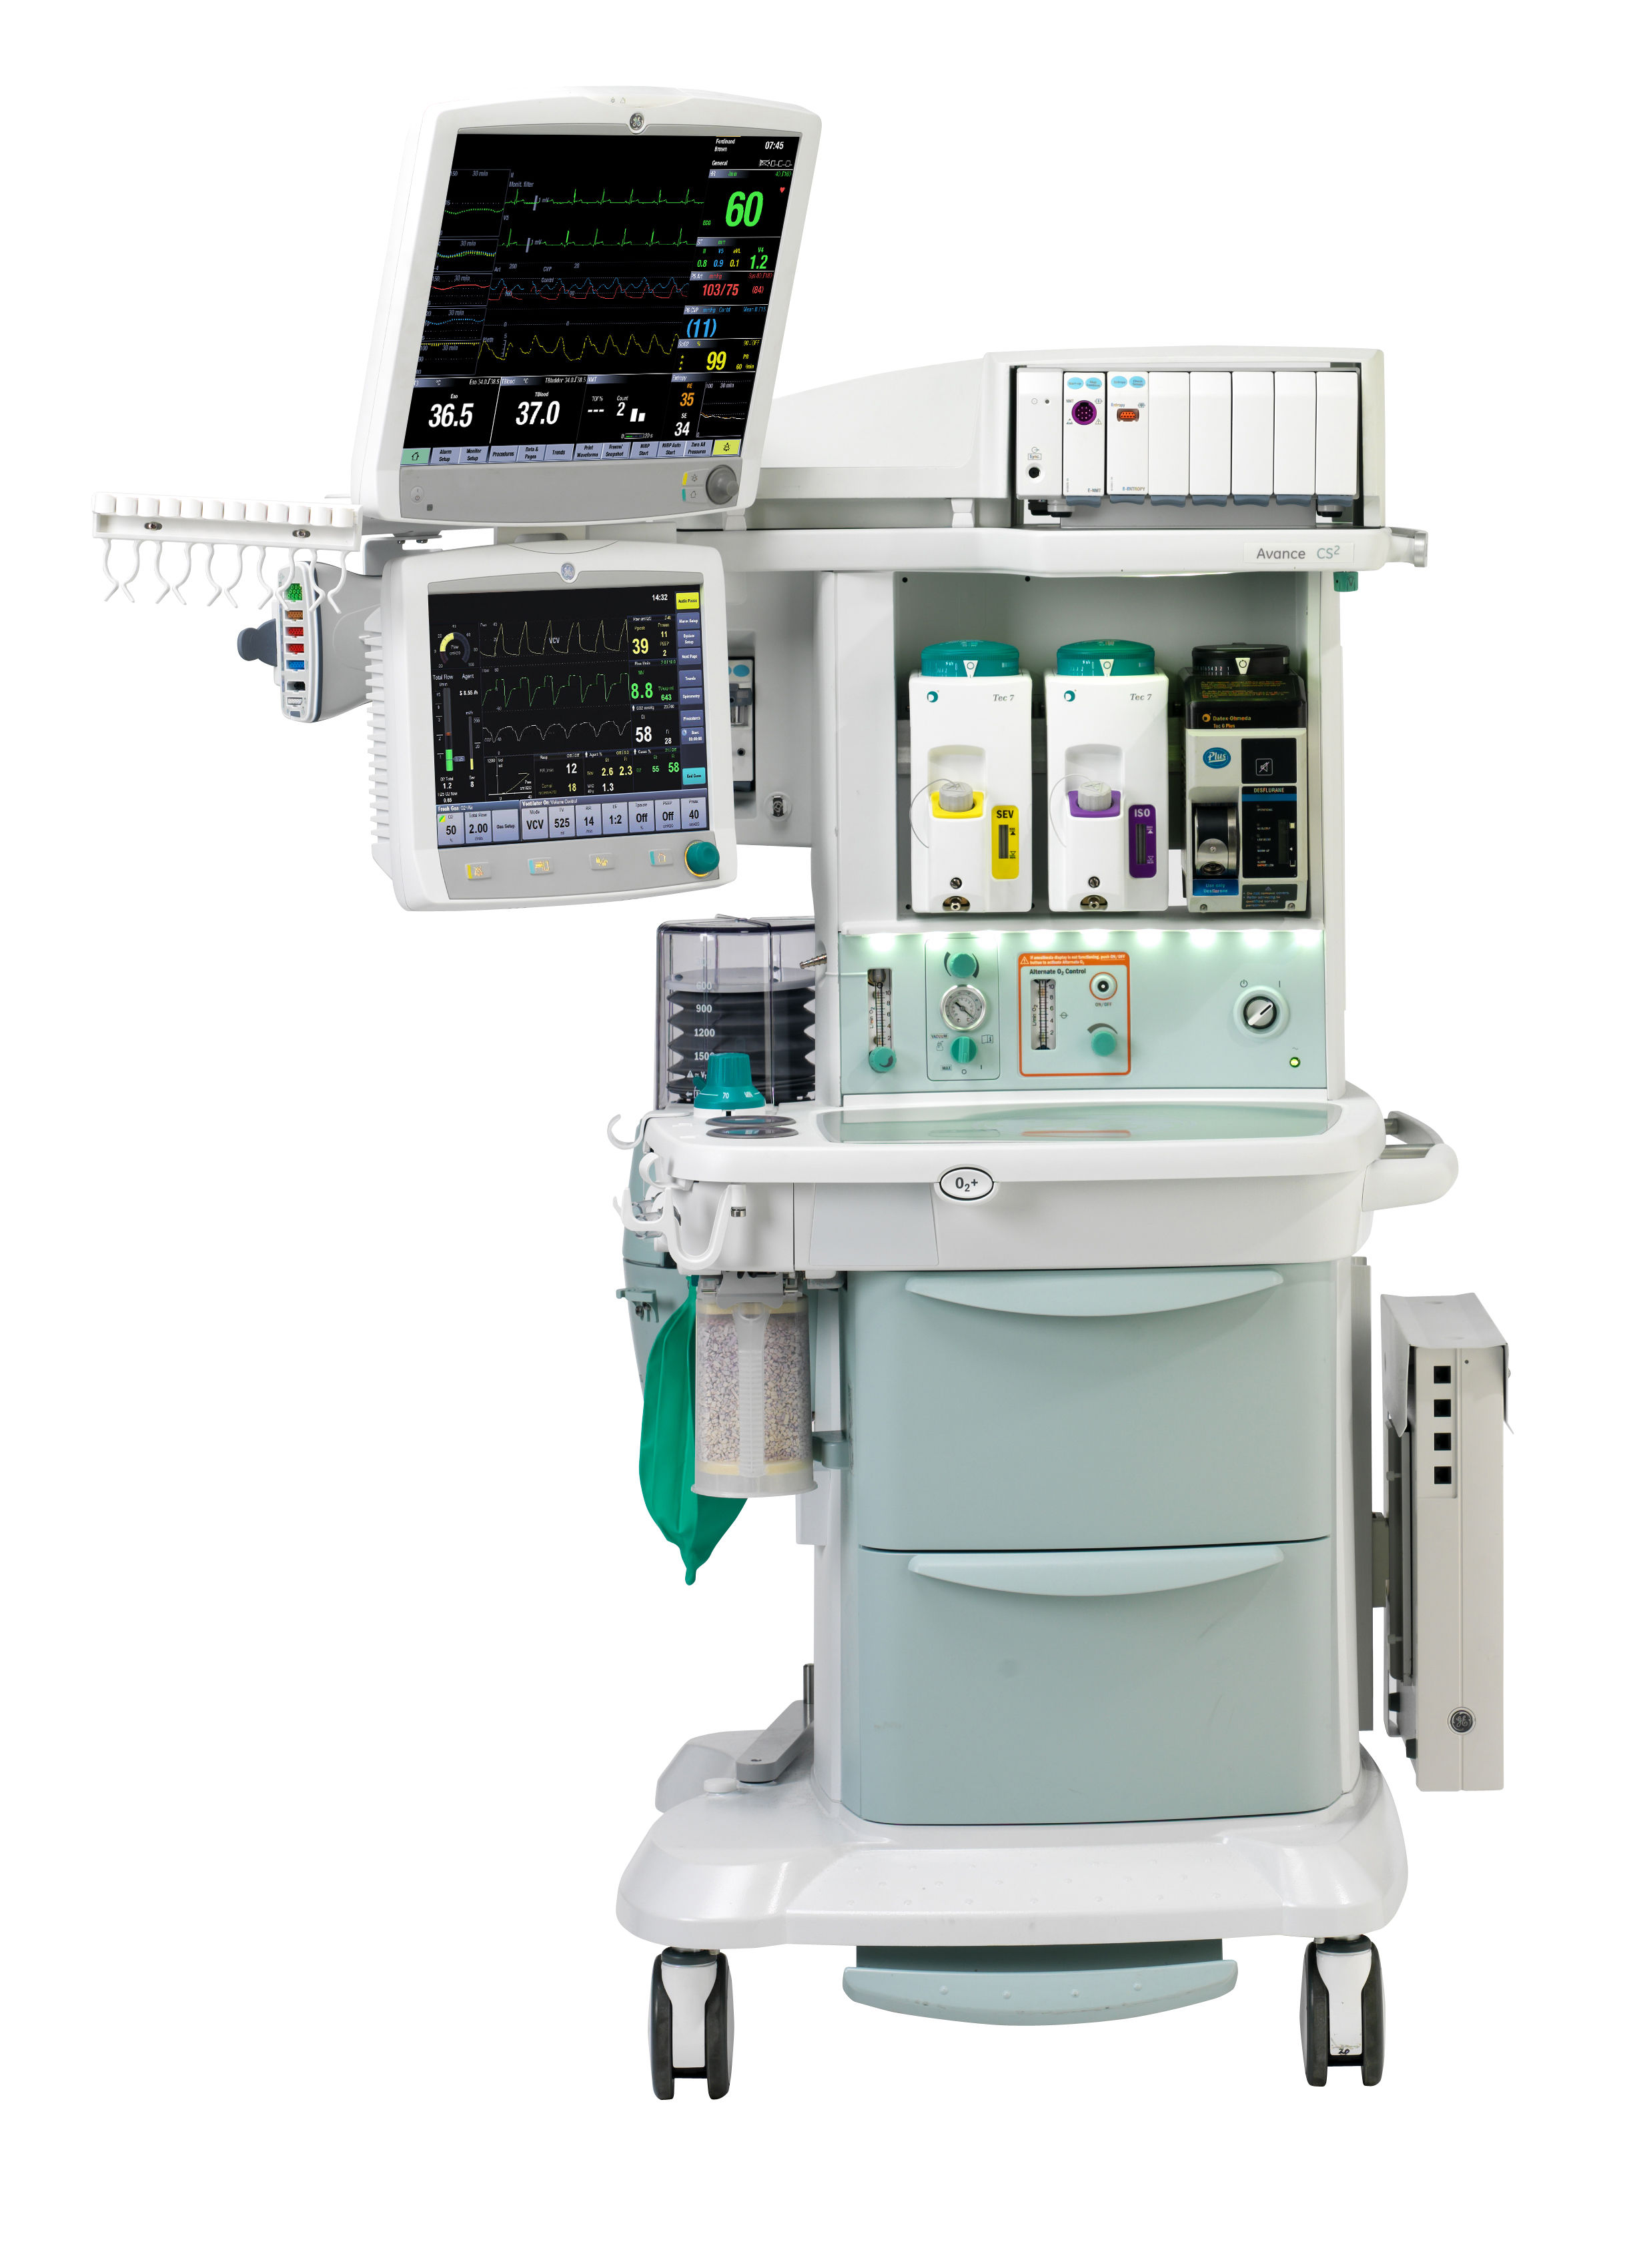 Ge Healthcare Avance Cs Anesthesia Machine Model Information